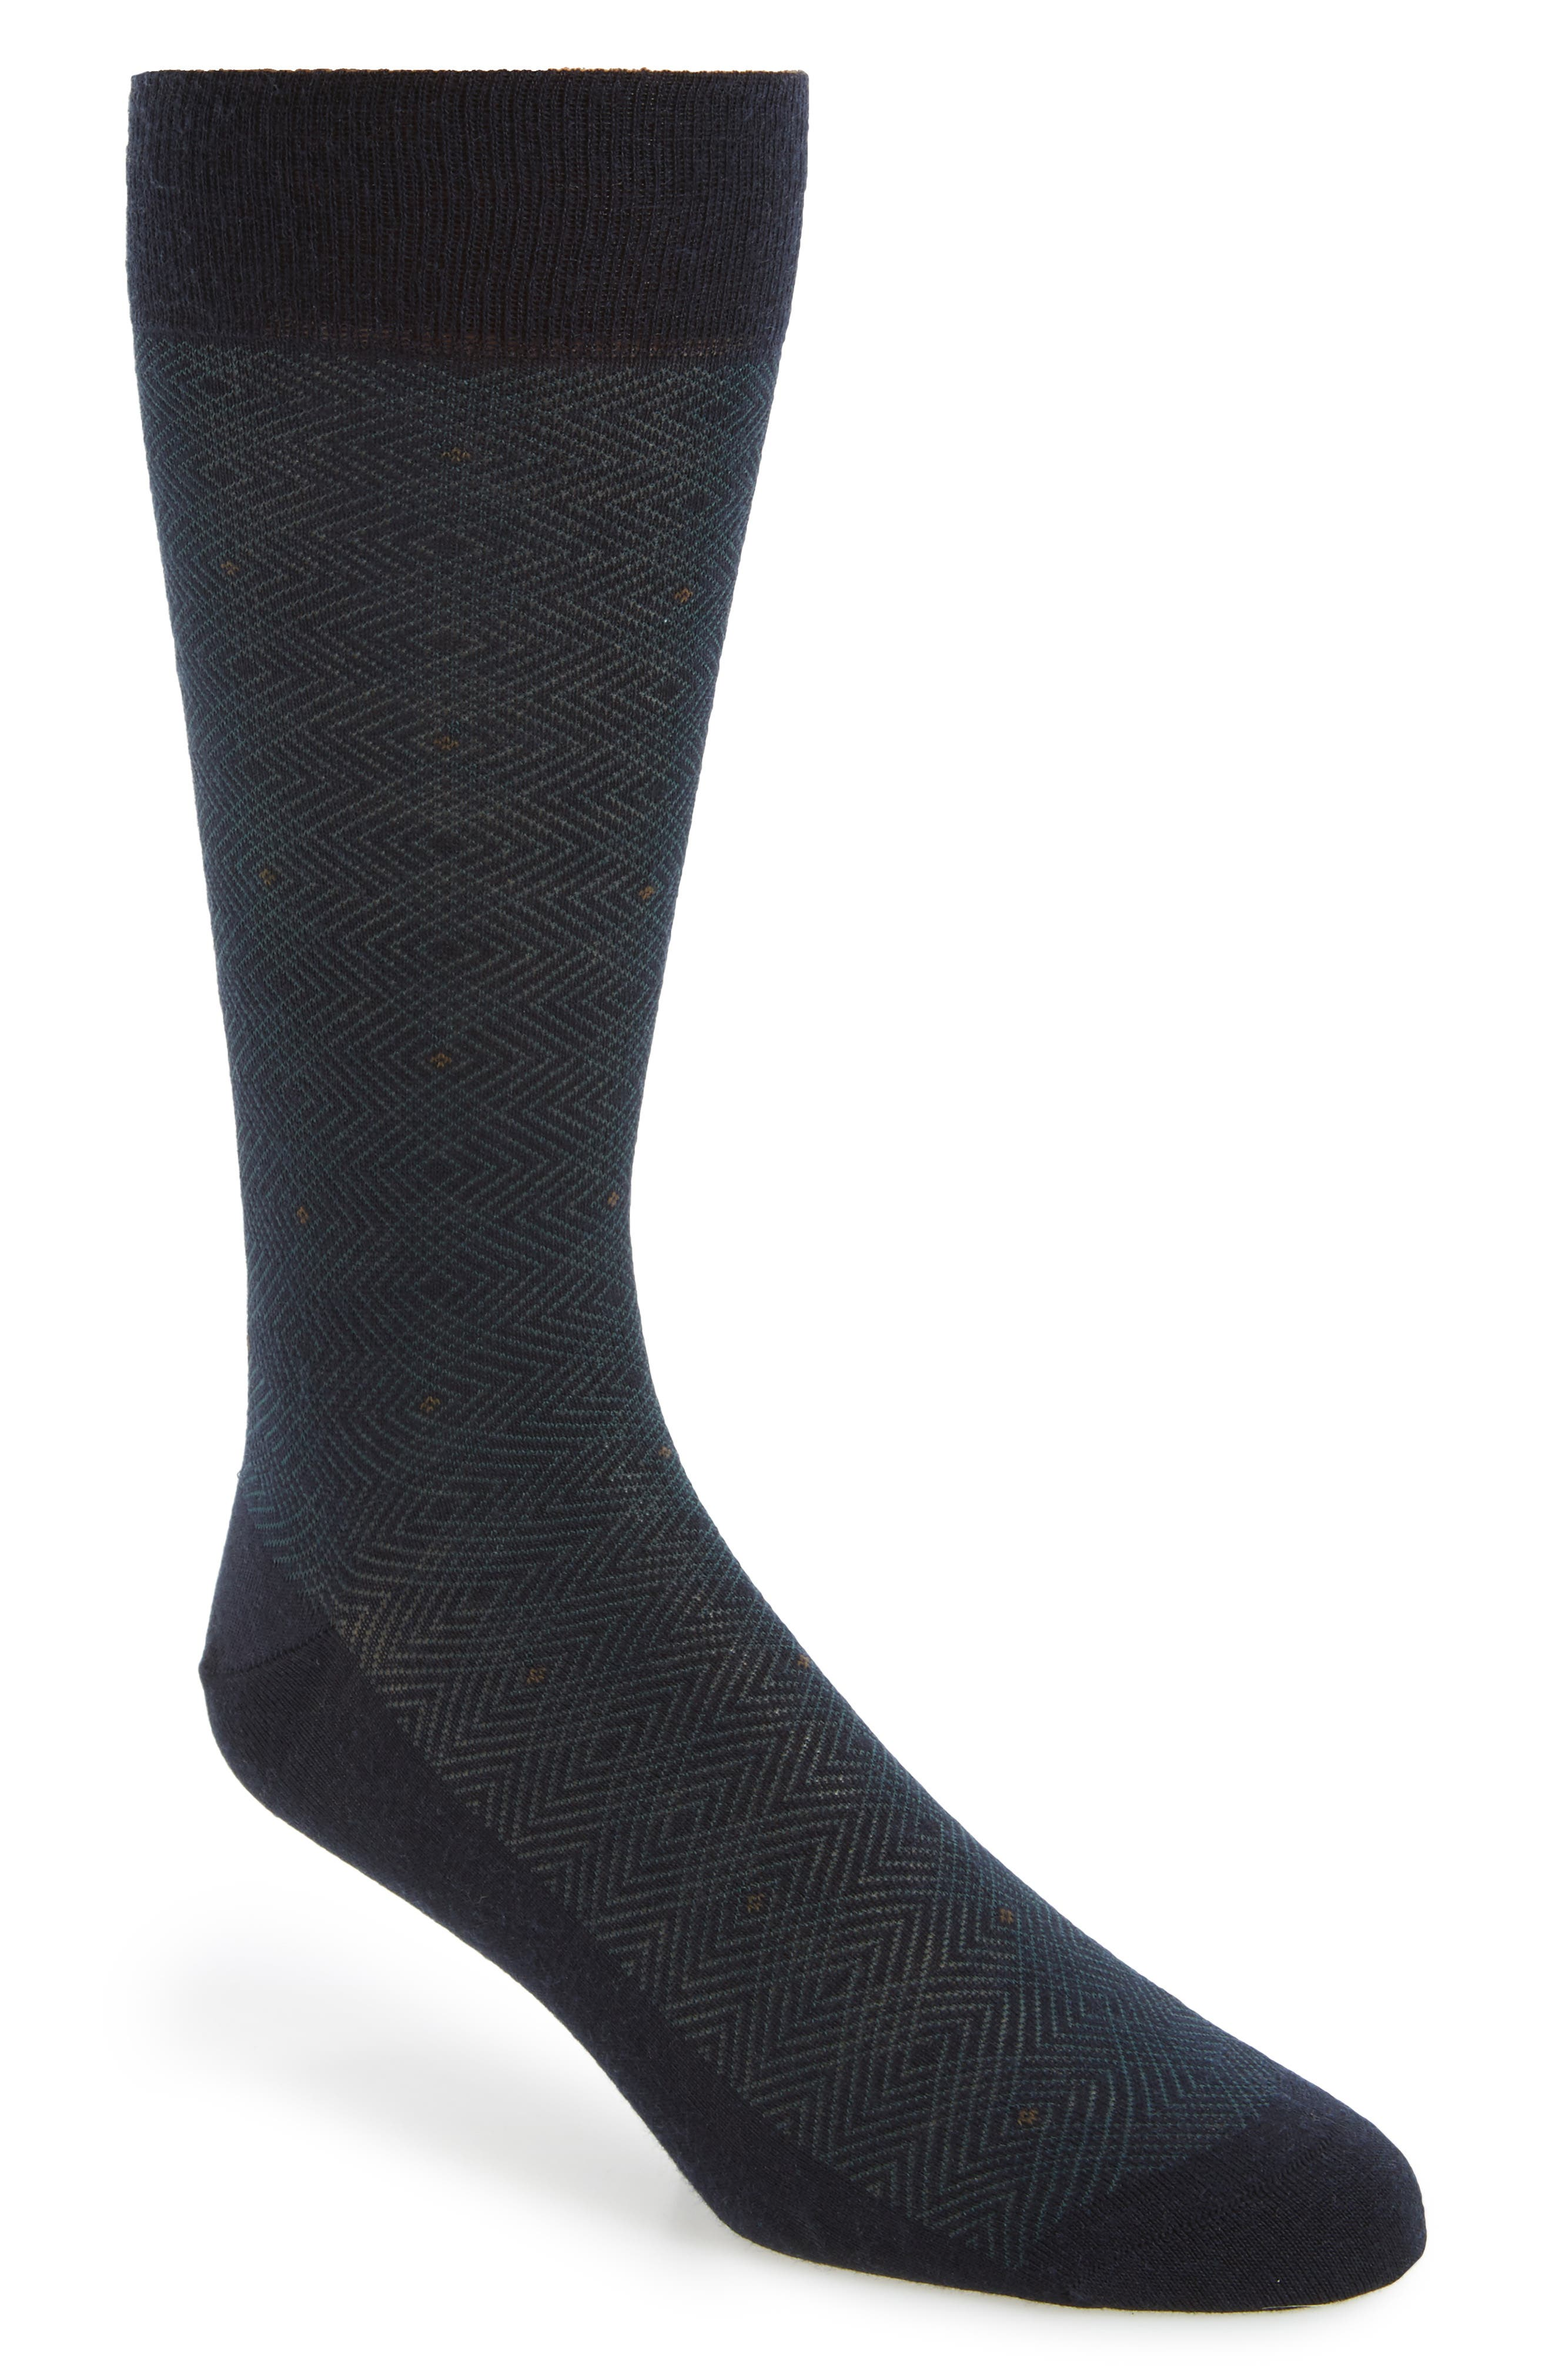 Merino Wool Blend Socks,                             Main thumbnail 1, color,                             Navy